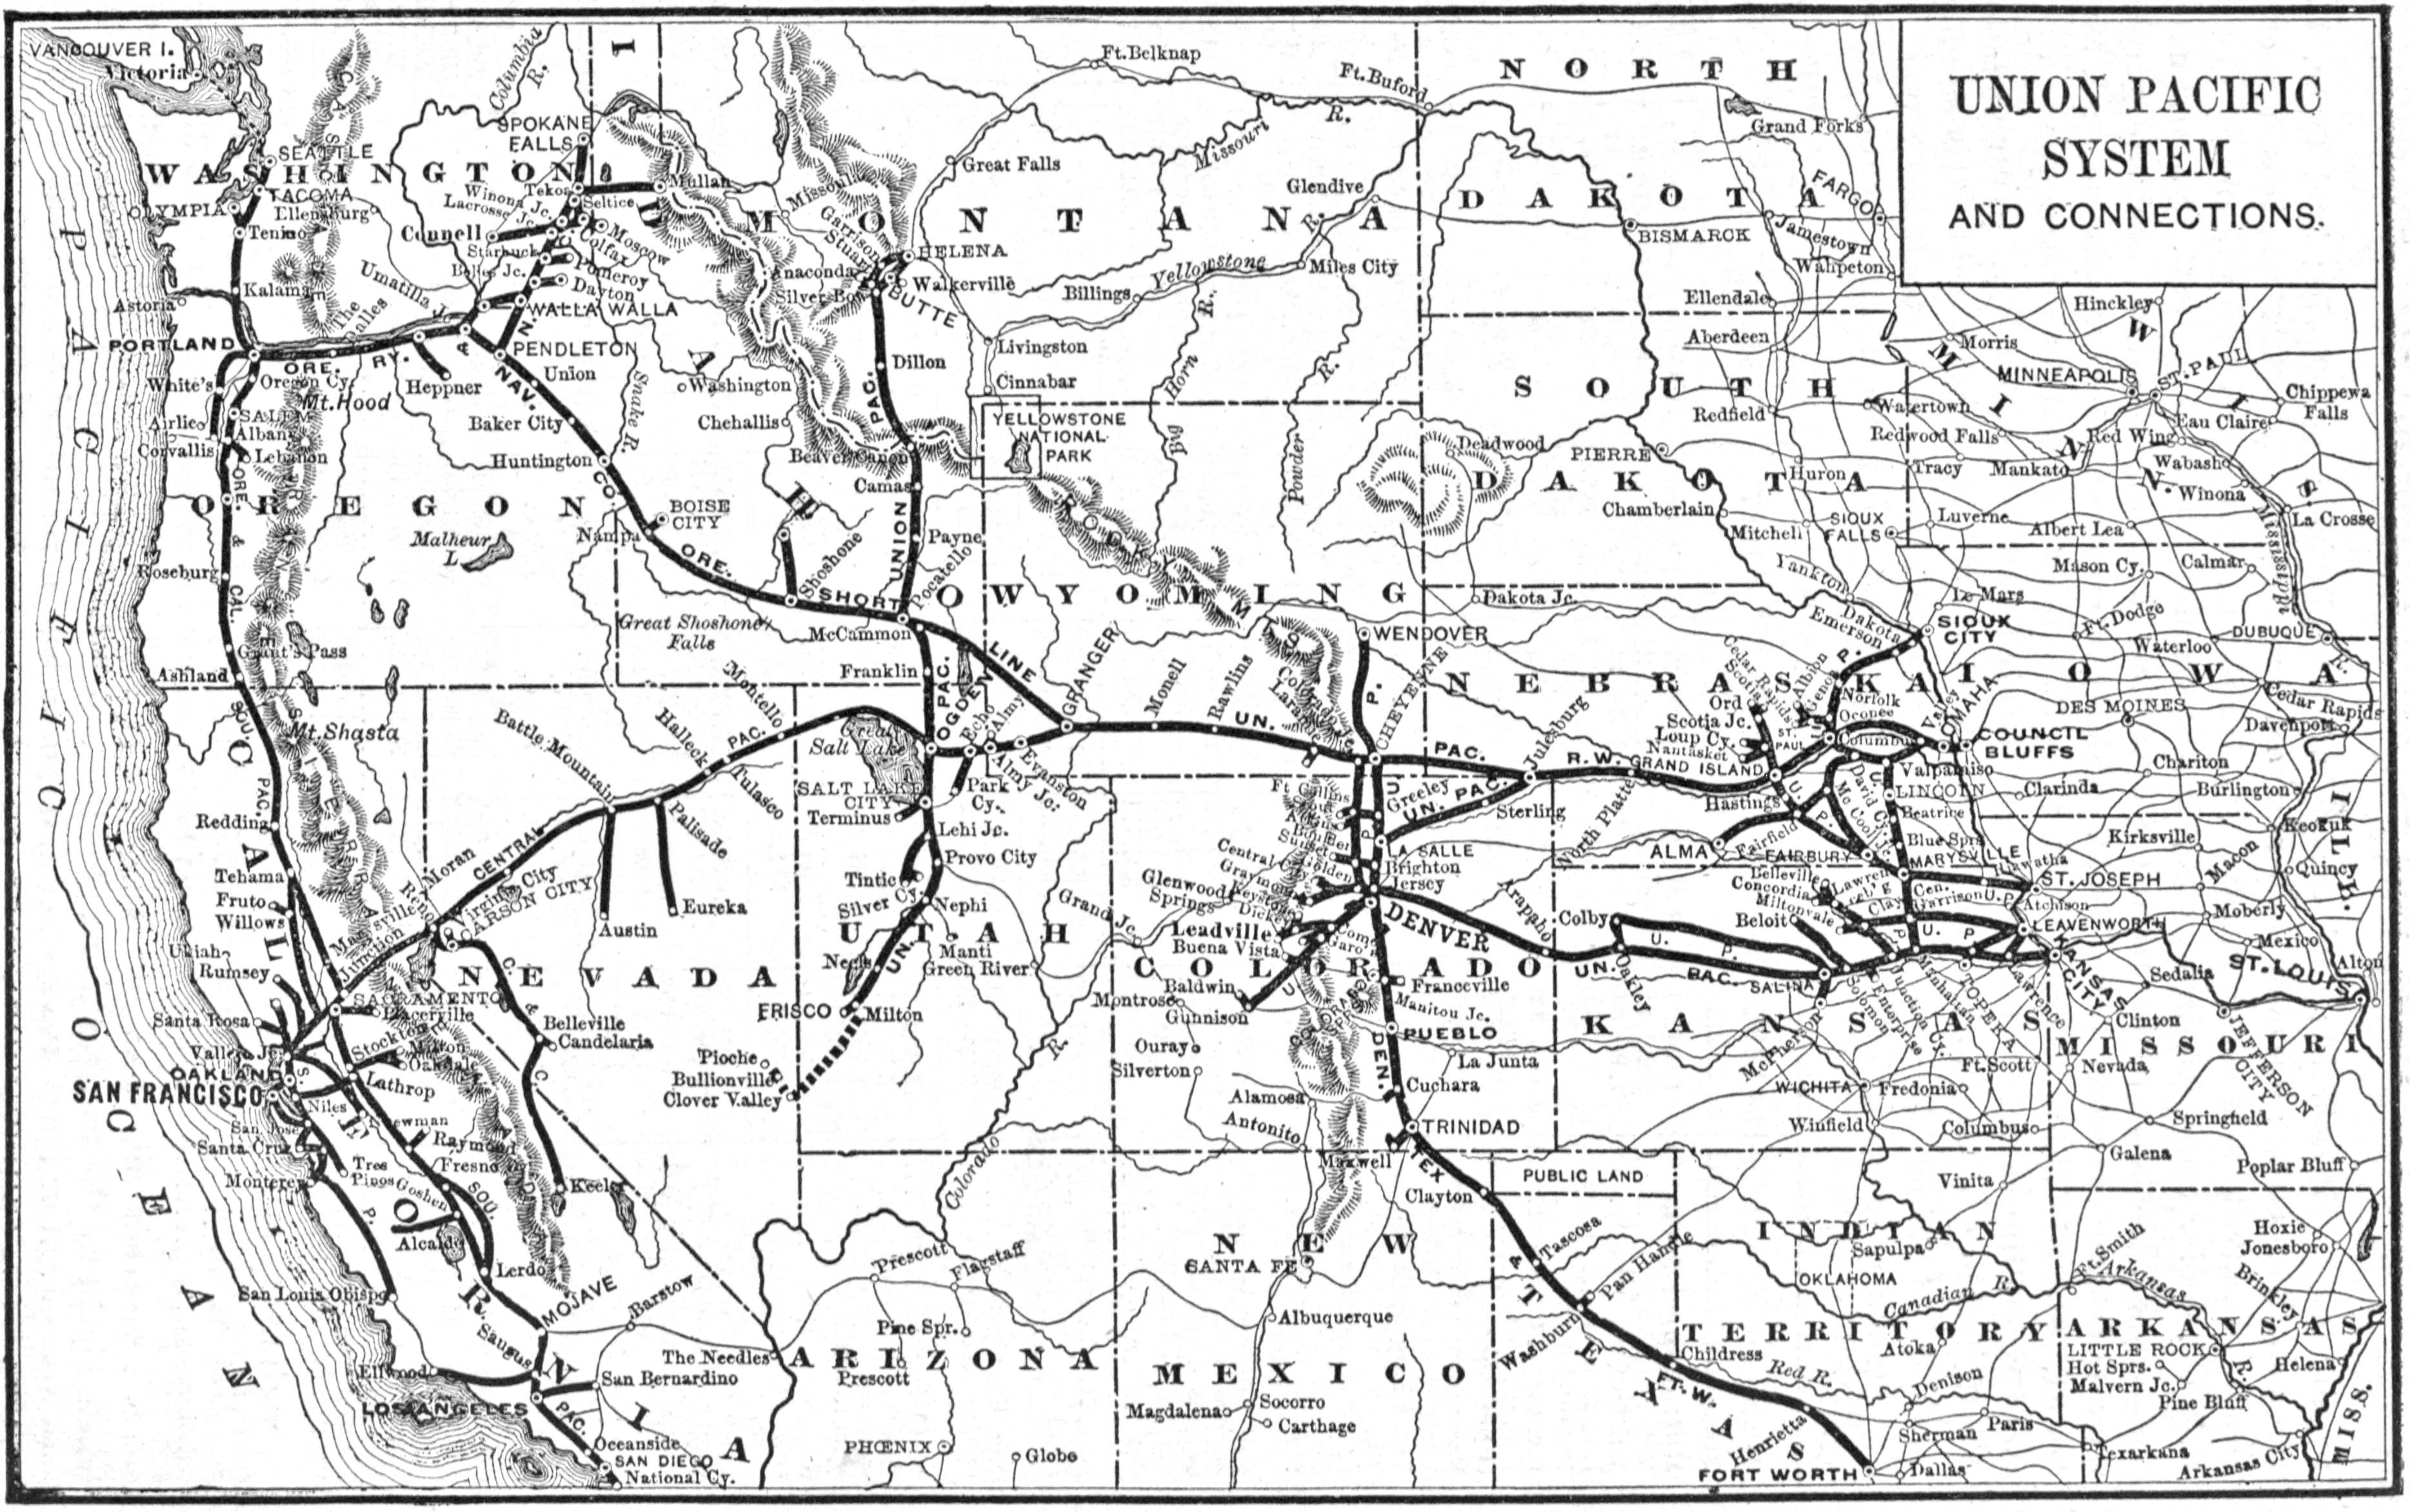 File1891 Pooru0027s Union Pacific Railwayjpg File1891 Pooru0027s